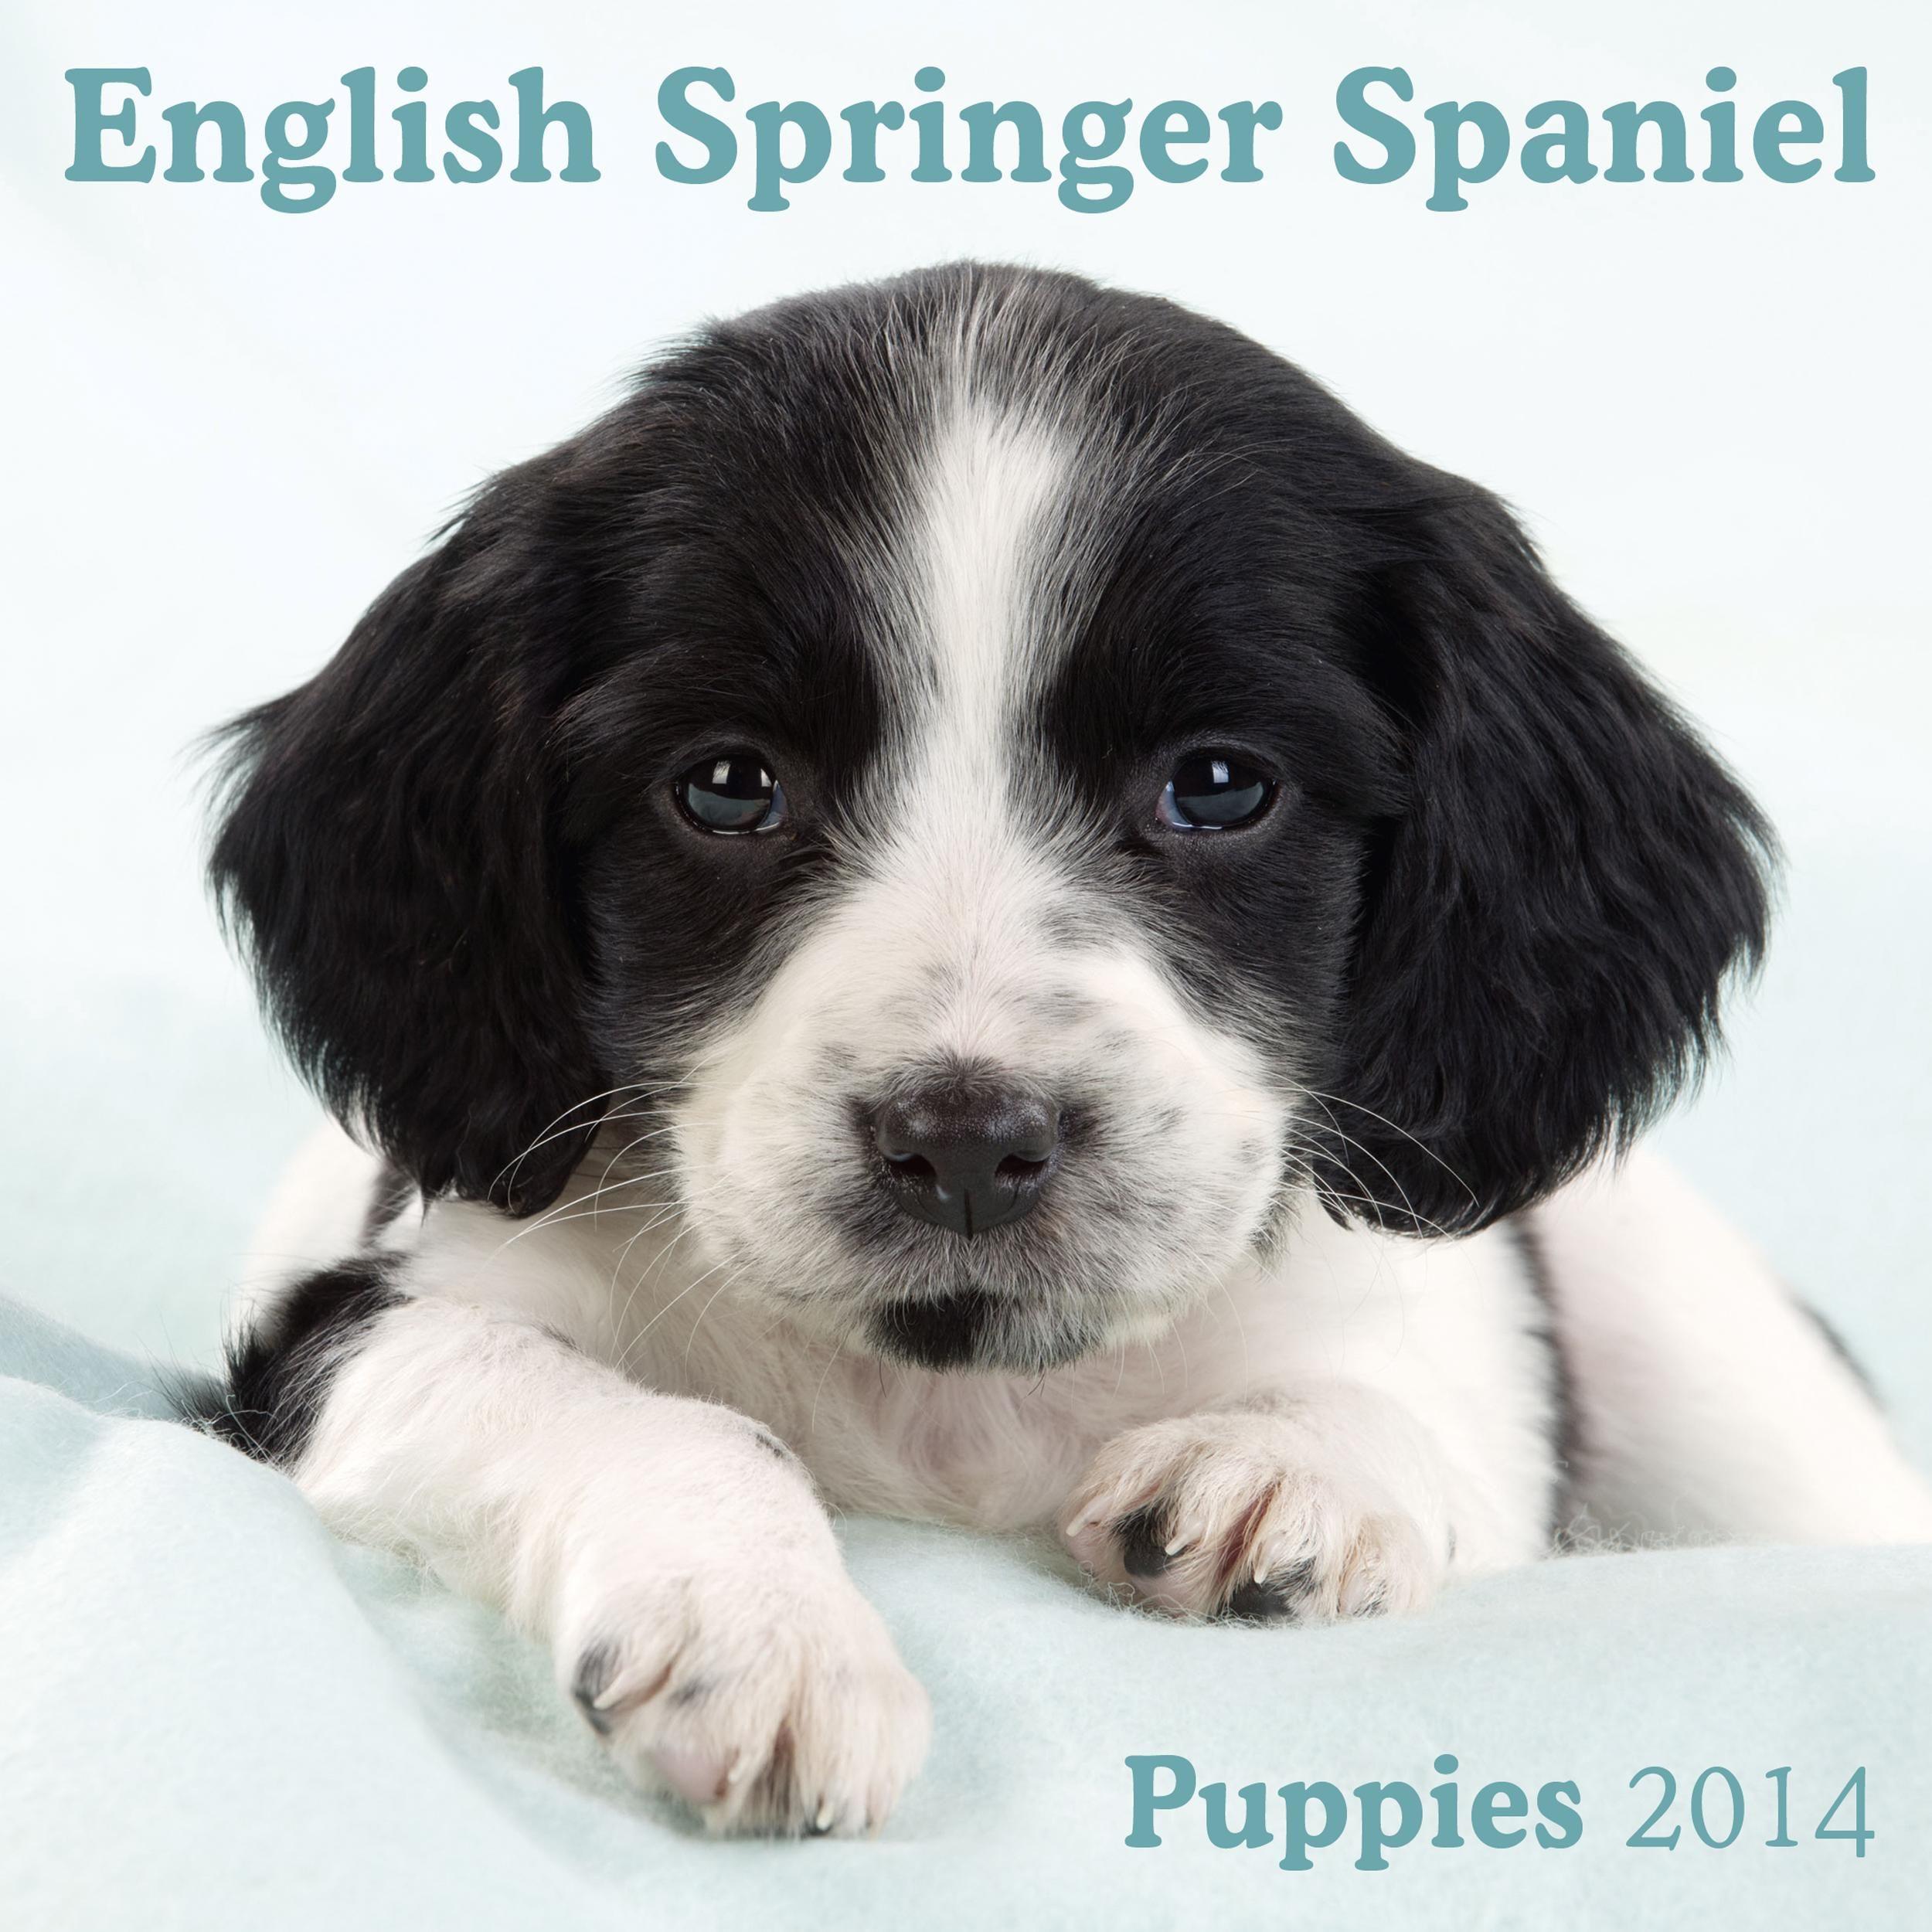 English Springer Spaniel puppy cute calendar Springer